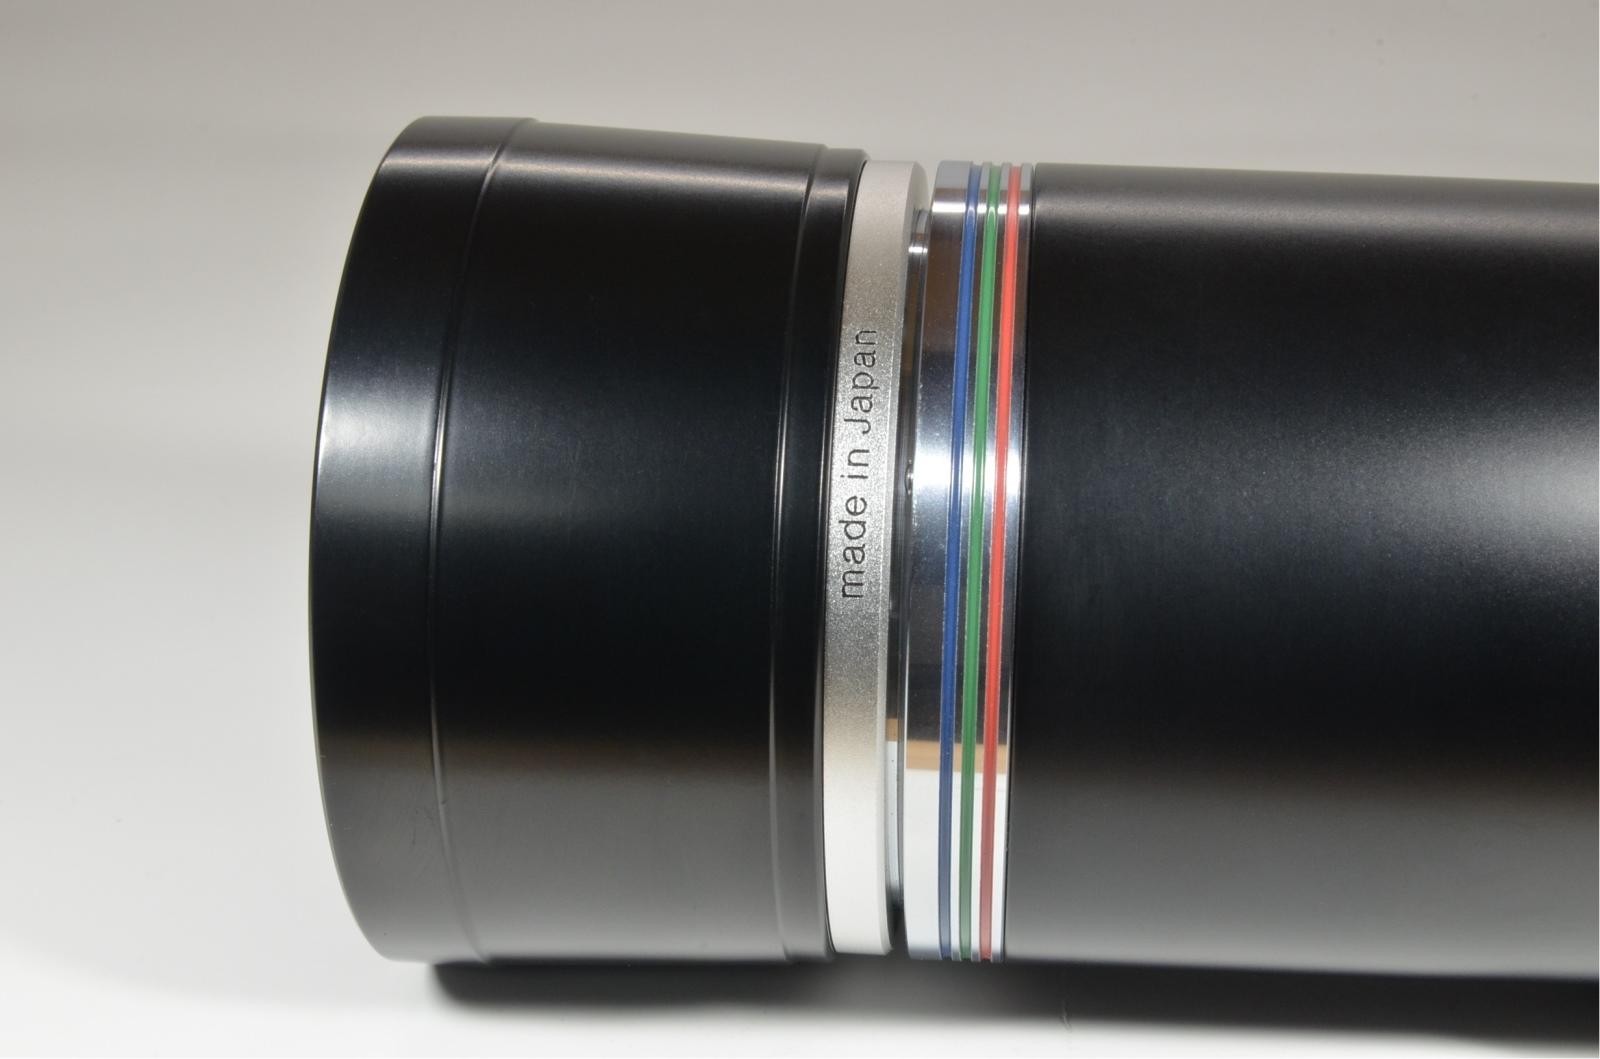 voigtlander apo-lanthar 180mm f/4 sl for ai-s nikon with hood